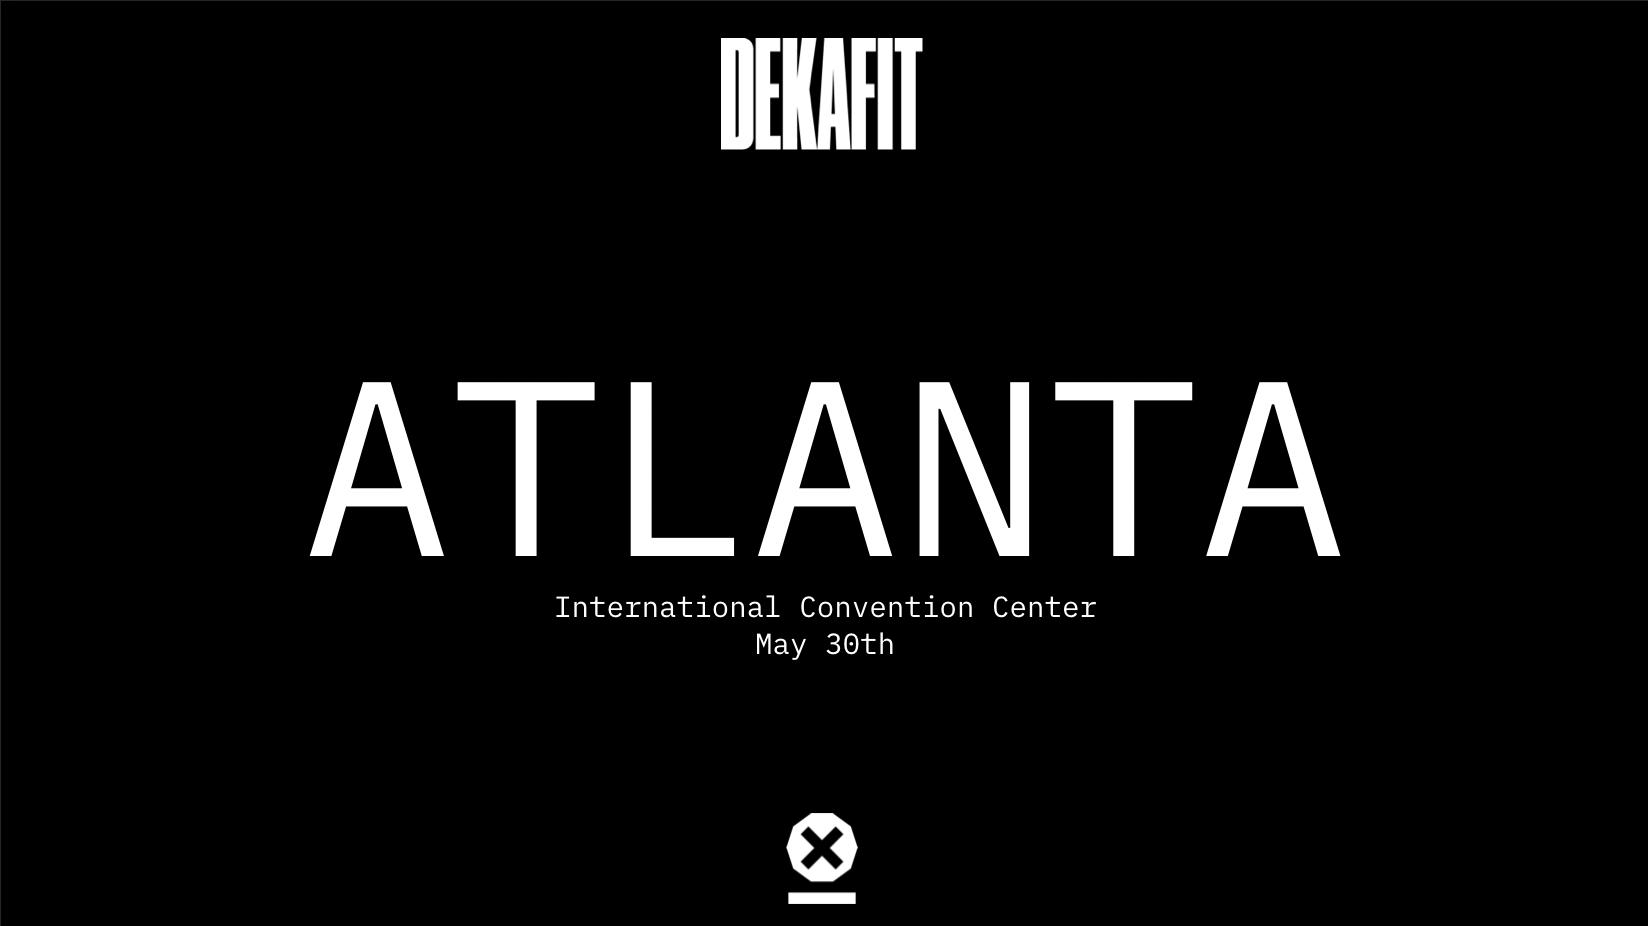 DEKAFIT Atlanta, GA